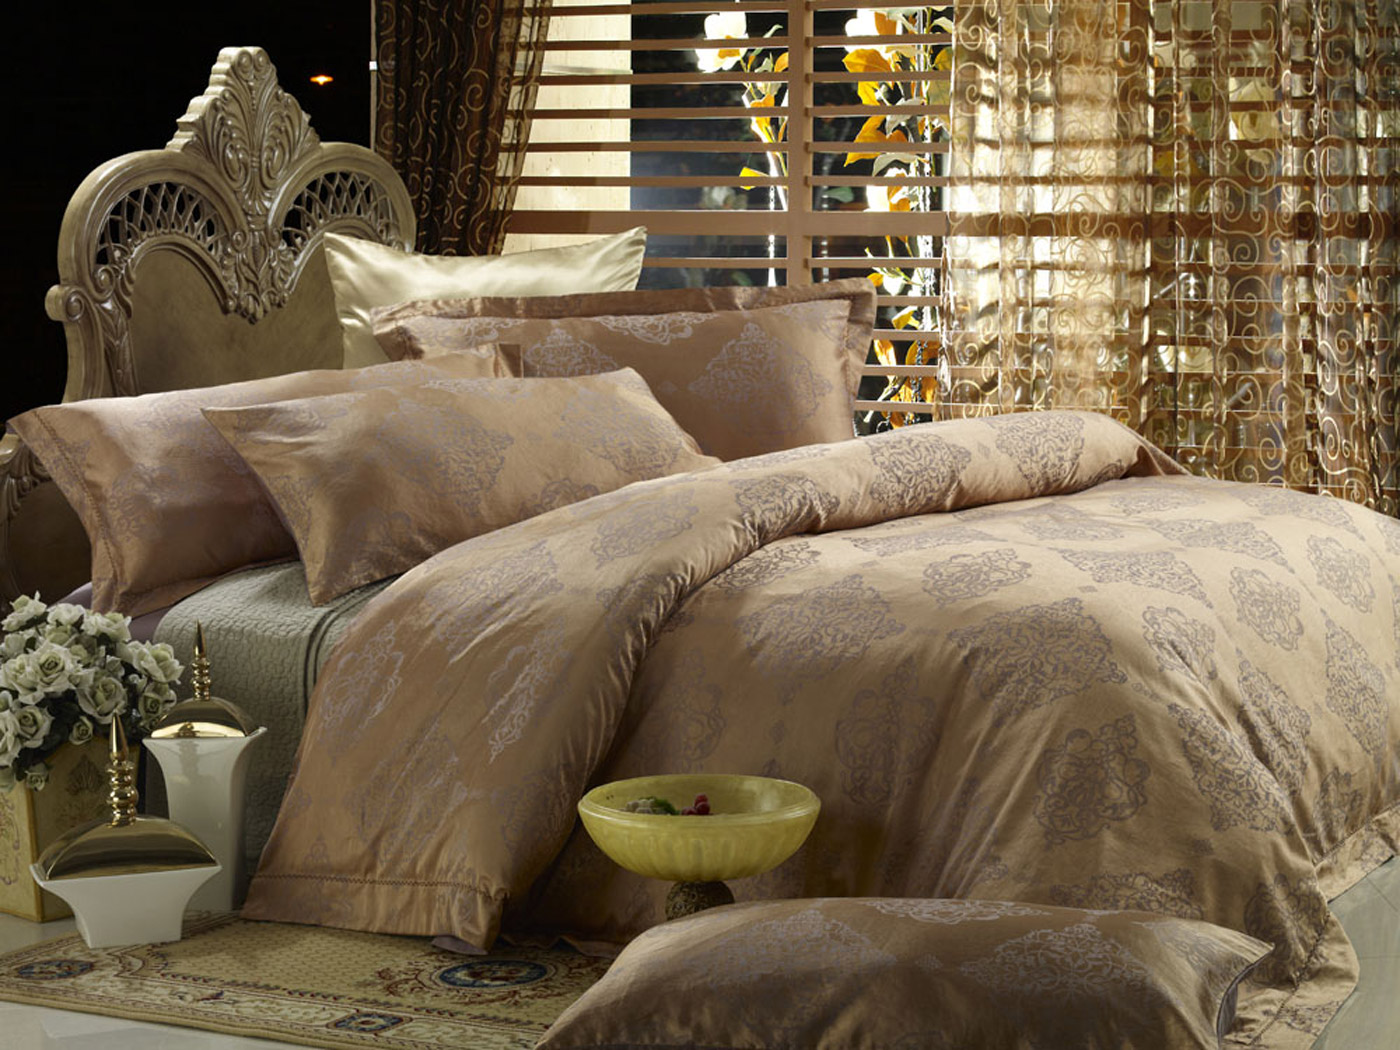 queen size duvet cover Duvet cover set Luxury Queen bedding Dolce Mela DM444Q queen size duvet cover